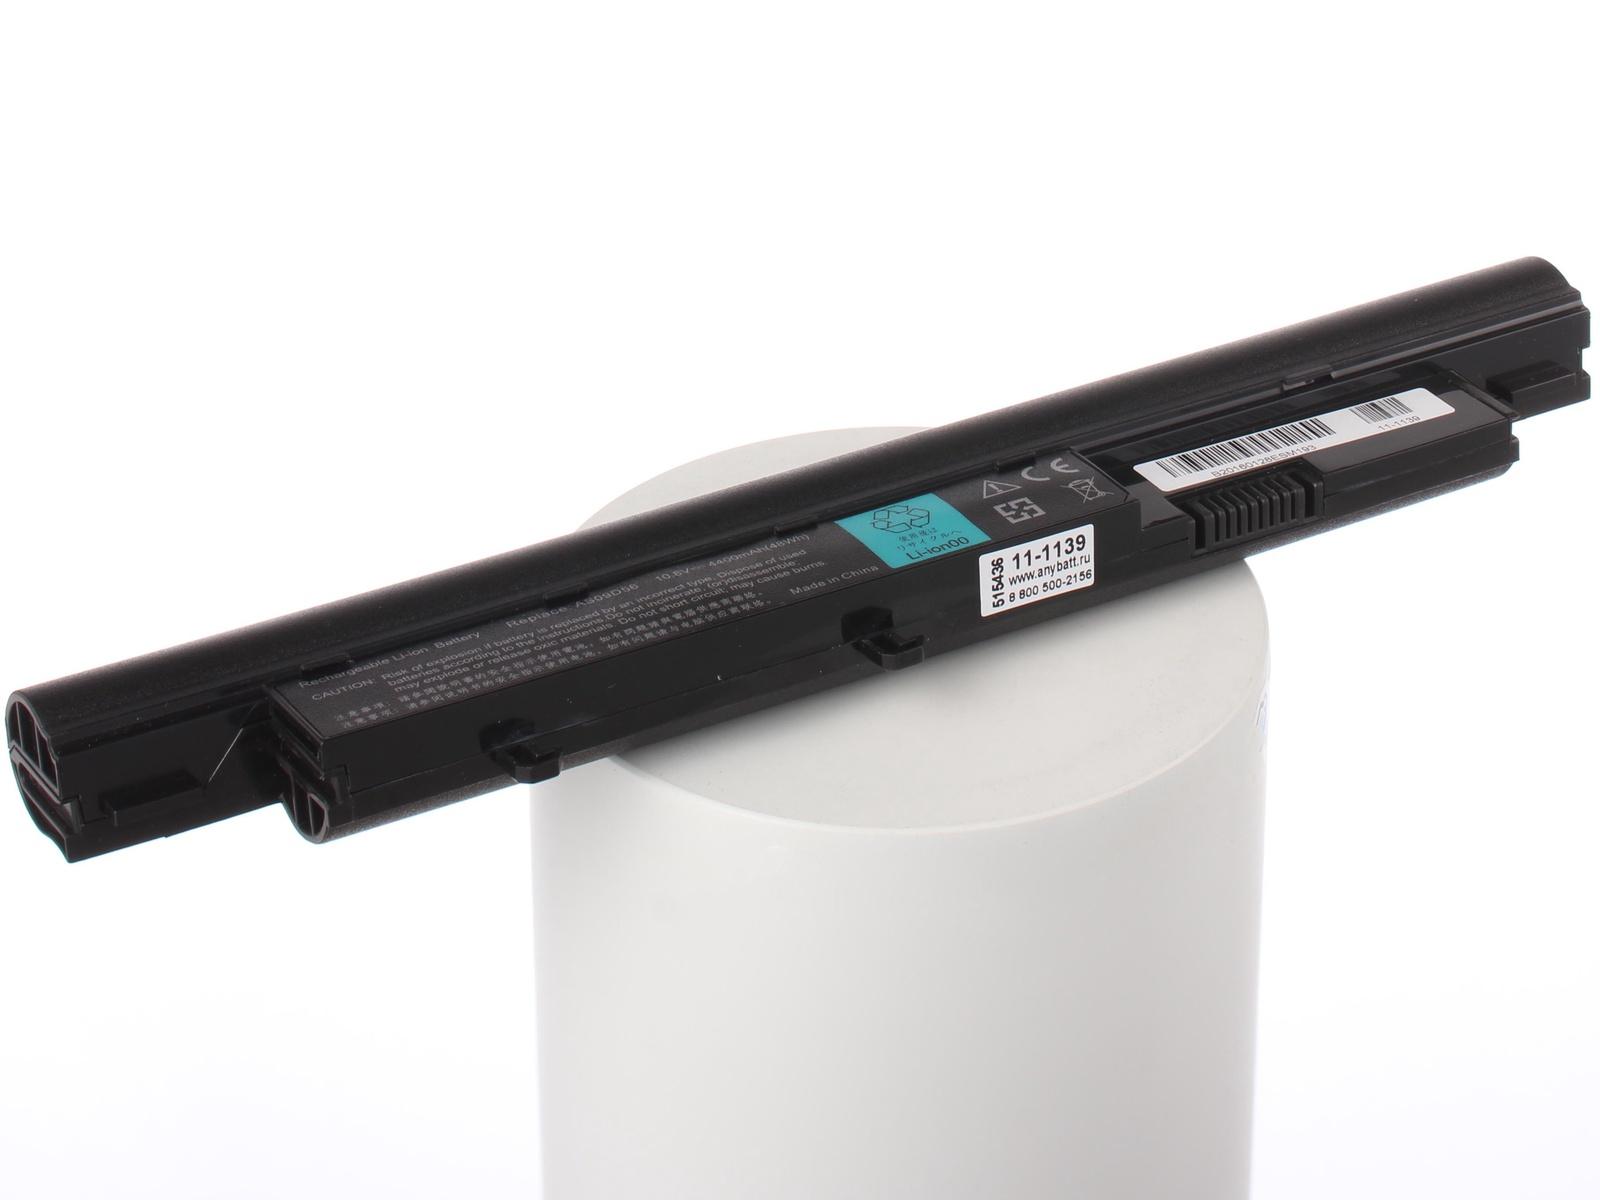 Аккумулятор для ноутбука AnyBatt для Acer Aspire 4410-723G25Mi, Aspire 5538G-313G32Mn, Travelmate 8371-944G25i, Aspire 3410-233G25i, Aspire 4810TG-354G32Mi, для Gateway EC38, EC54, EC58, для Packard Bell EasyNote Butterfly S mymei outdoor 90db ring alarm loud horn aluminum bicycle bike safety handlebar bell